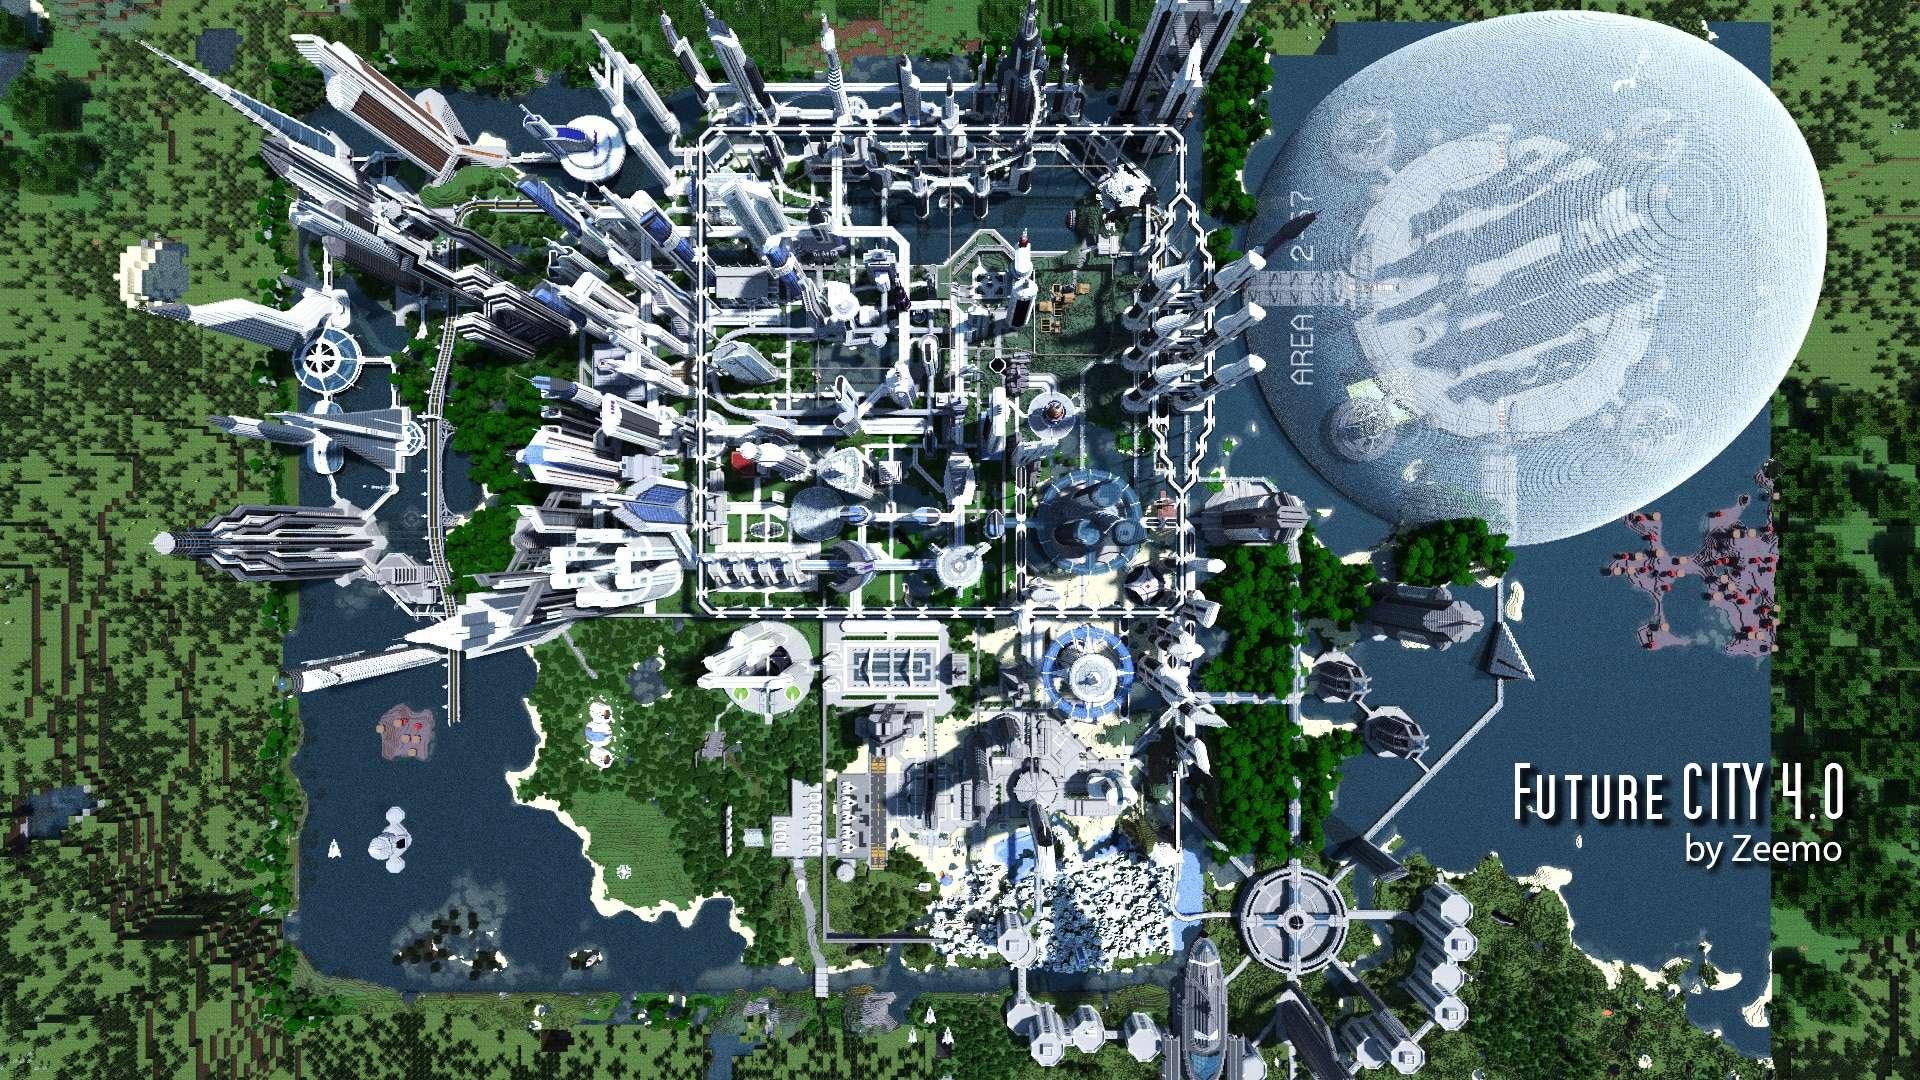 future-city_4-0_02